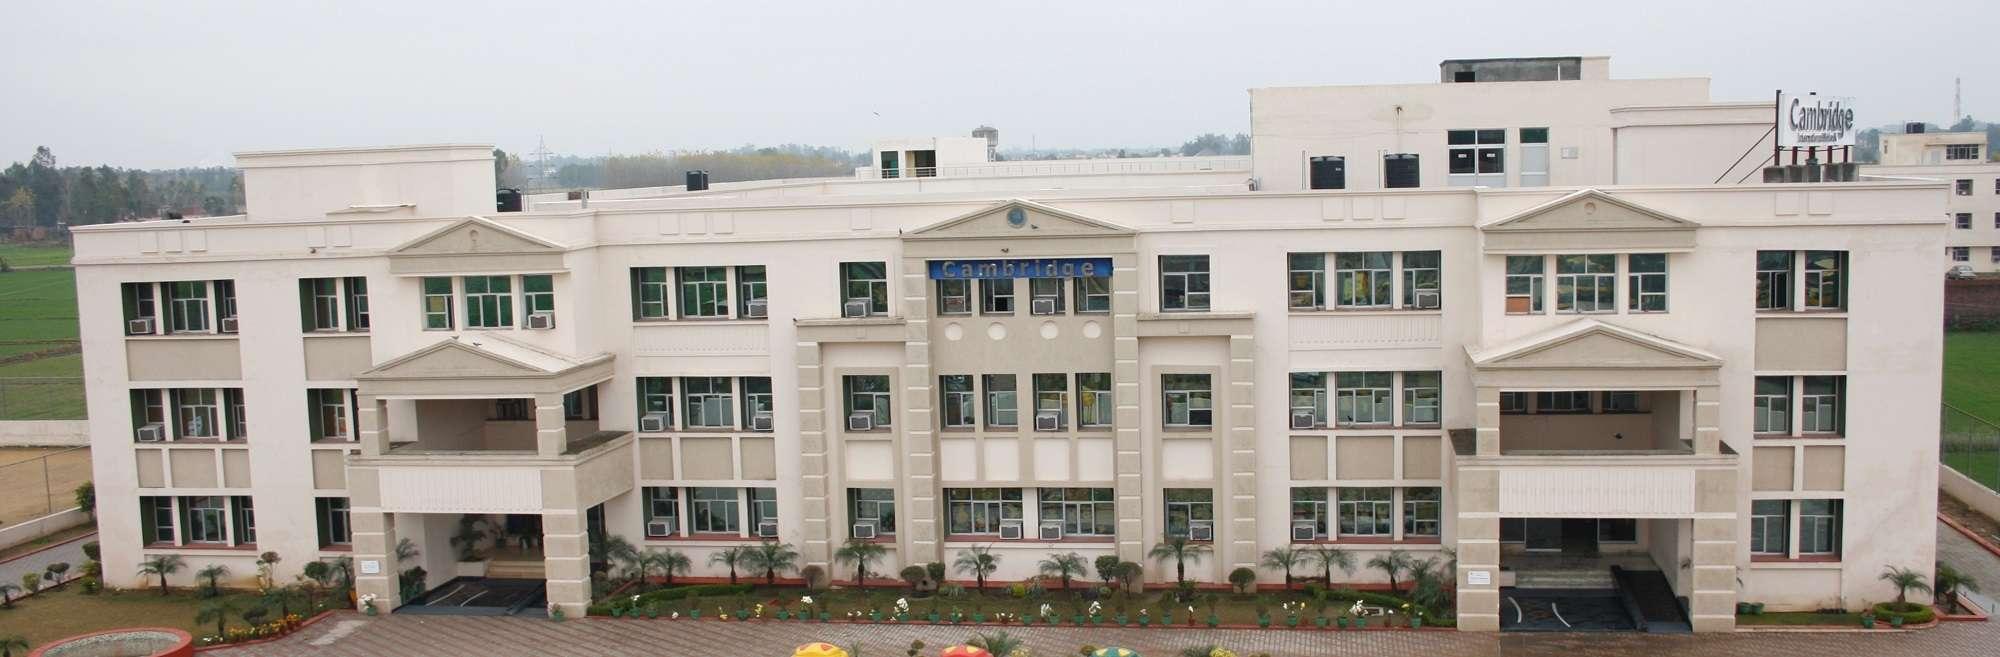 Cambridge International School Hajipur Road DasuyaTehsil DasuyaDistrict Hoshiarpur Pb 1630467